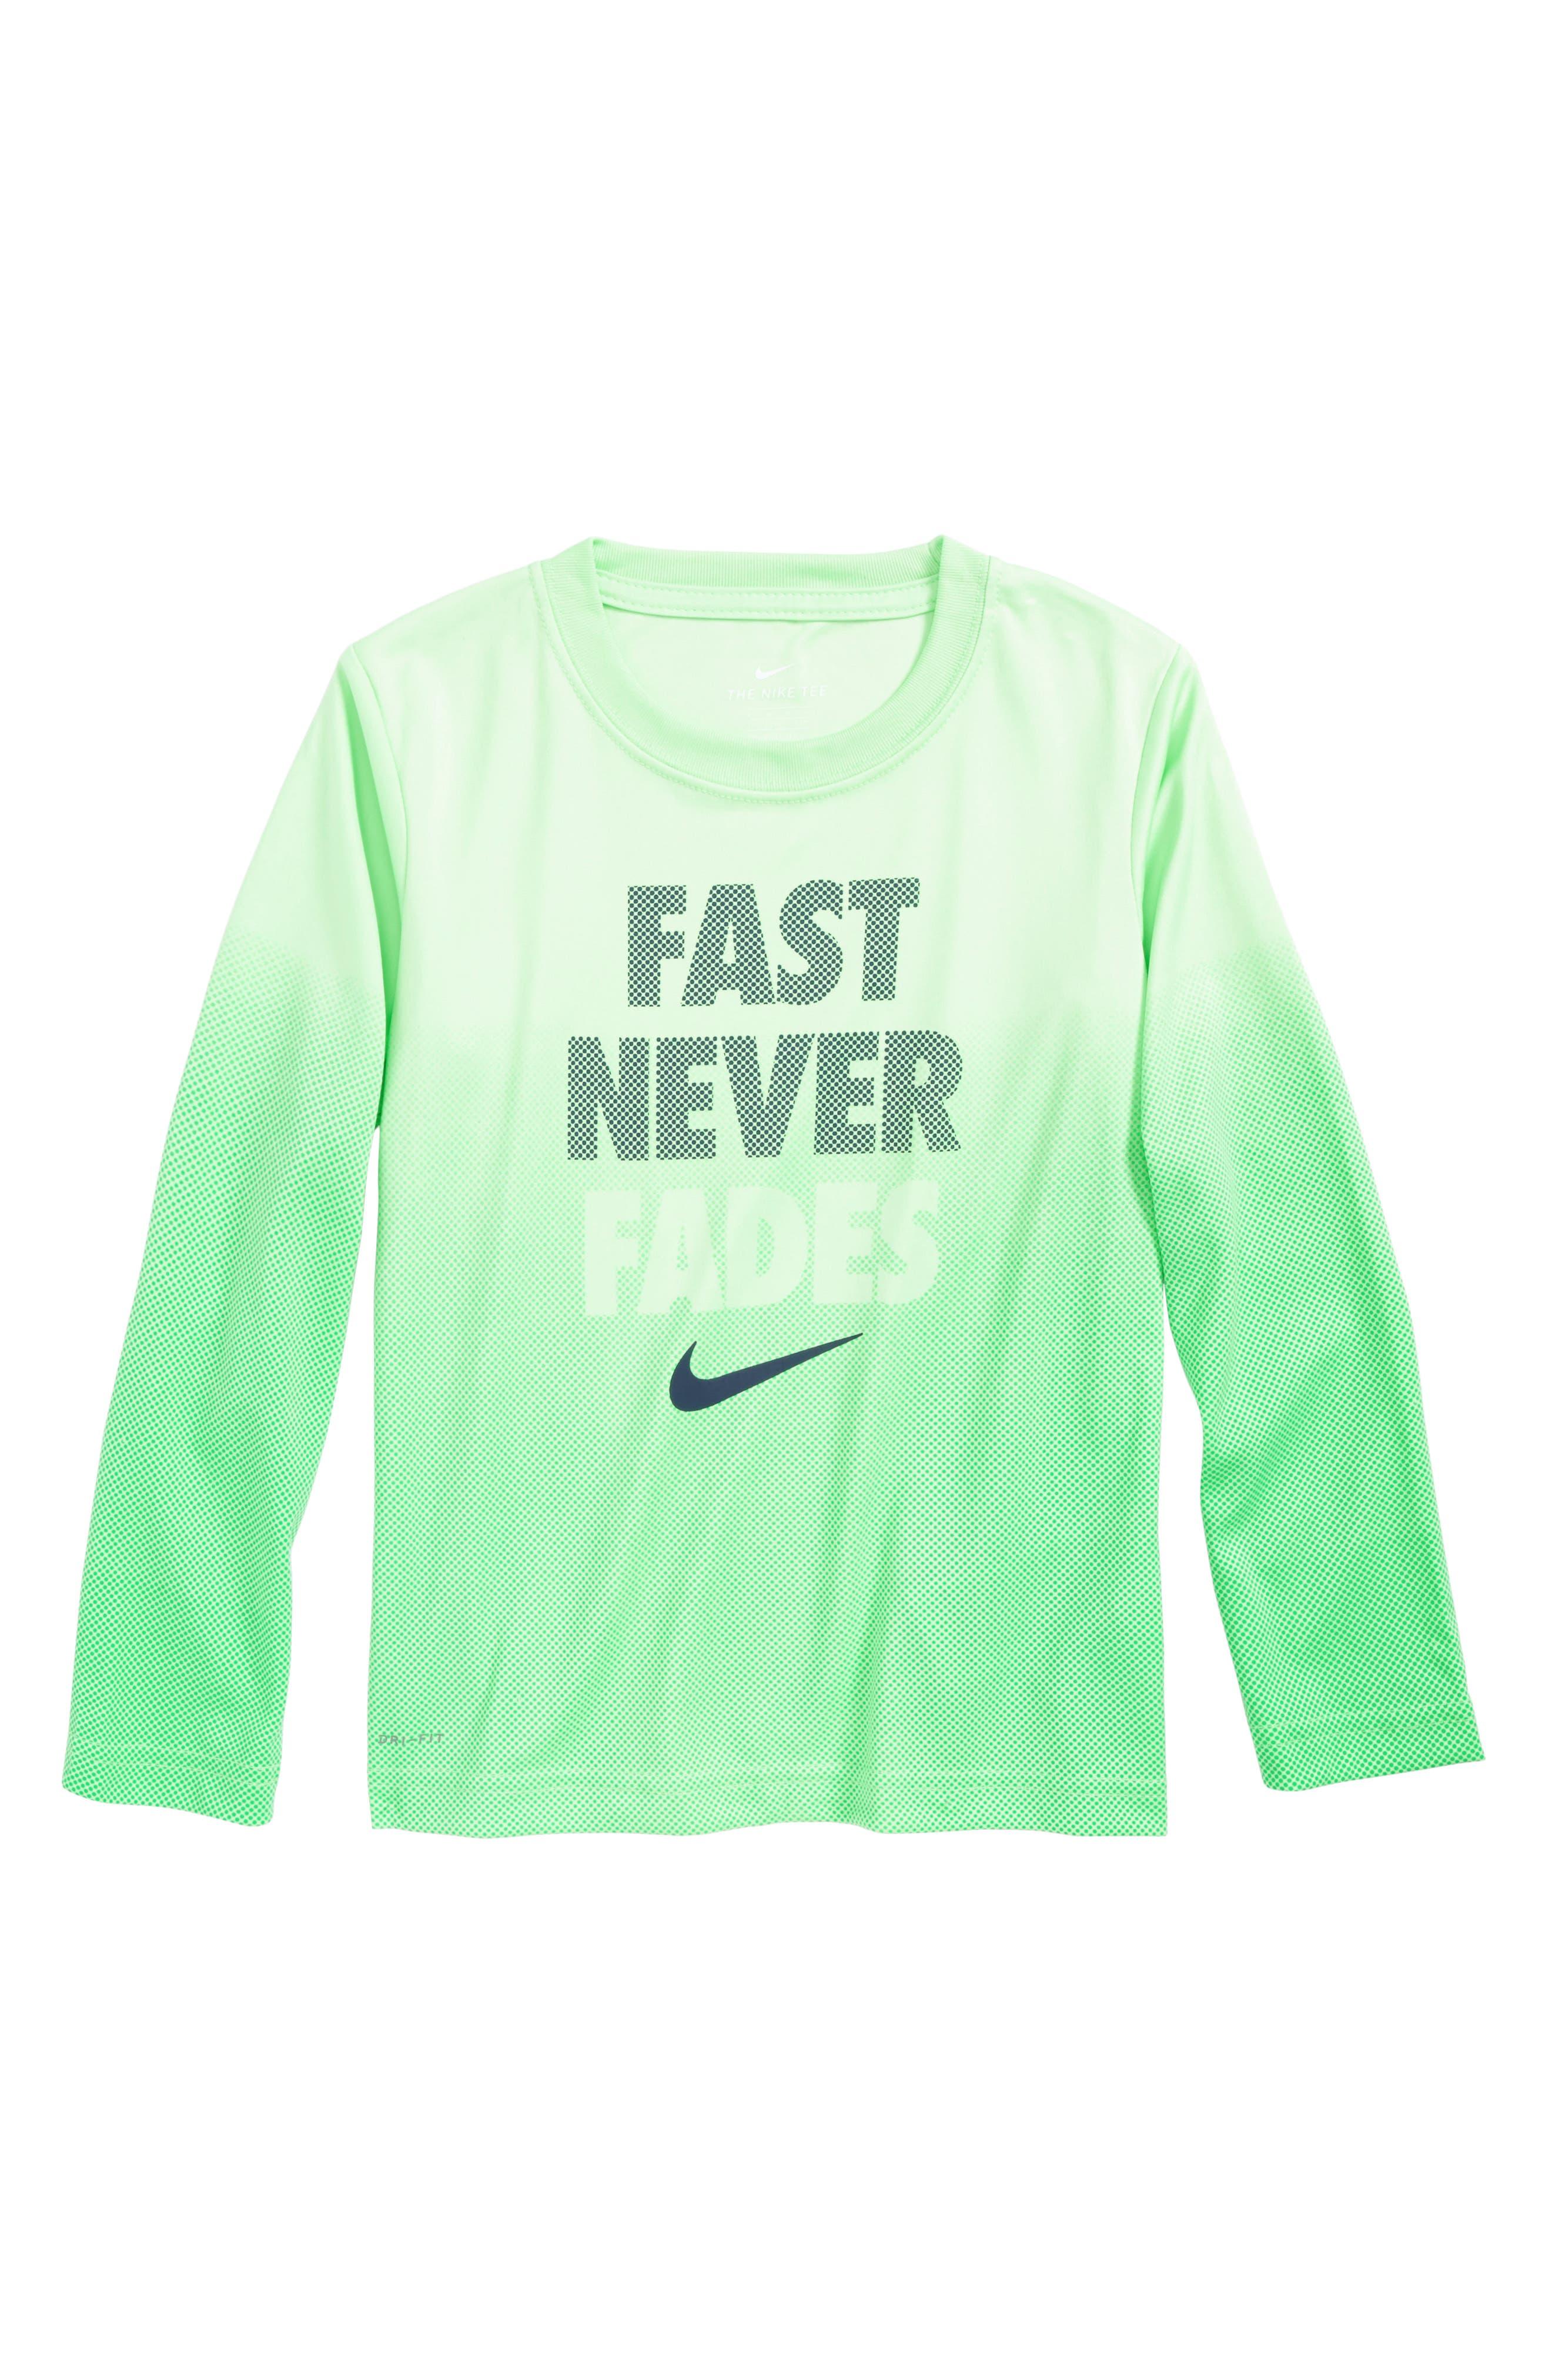 Fast Never Fades Long Sleeve T-Shirt,                             Main thumbnail 1, color,                             Illusion Green